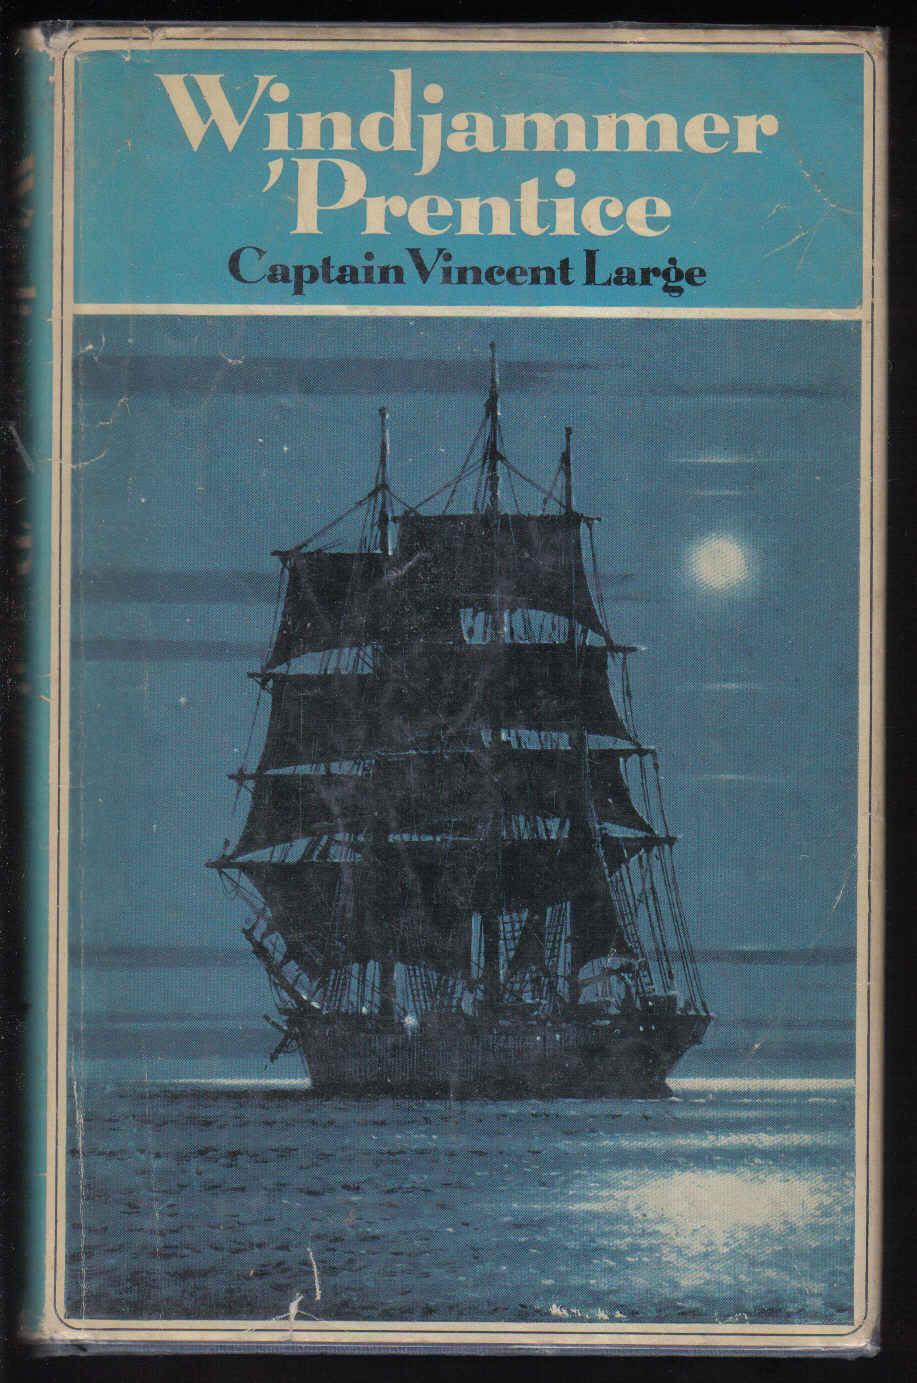 Windjammer . Prentice by Captain Vincent Large